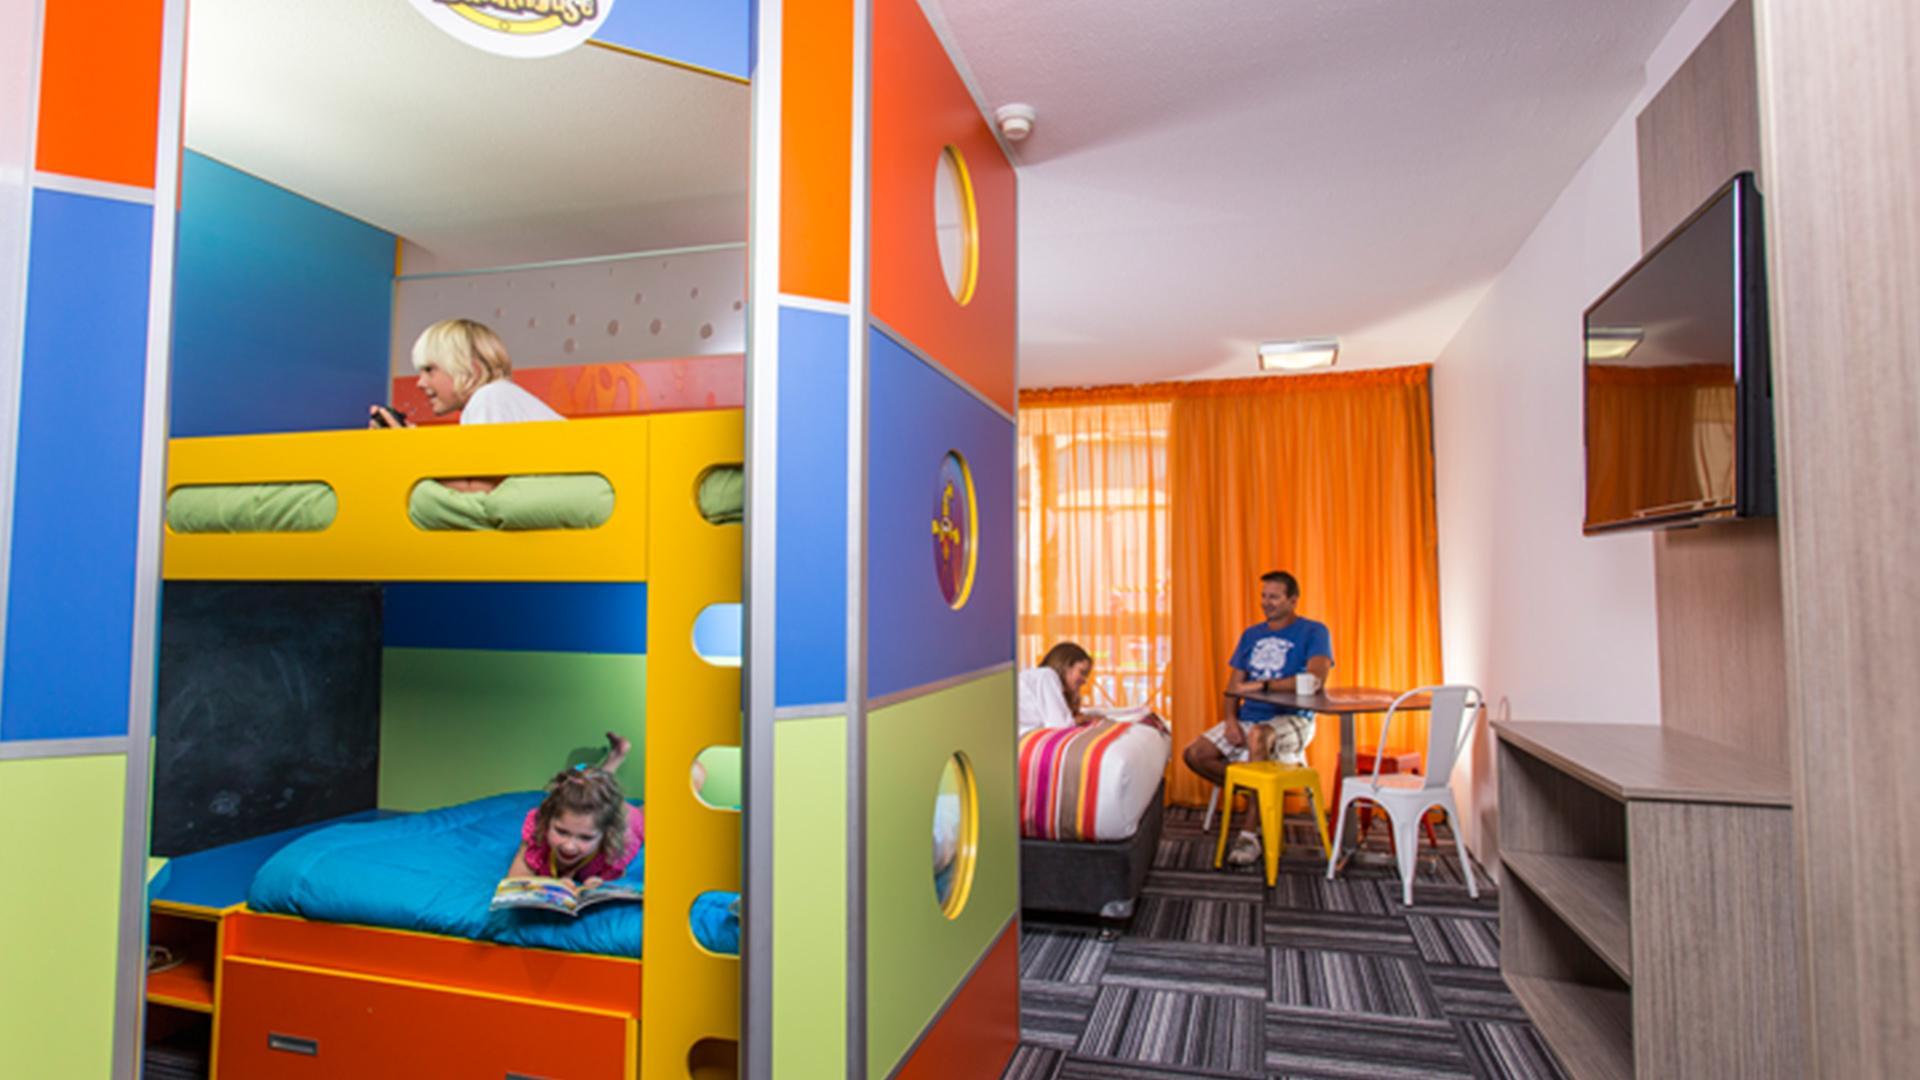 Superior Junior Bunkhouse image 1 at Paradise Resort Gold Coast by City of Gold Coast, Queensland, Australia